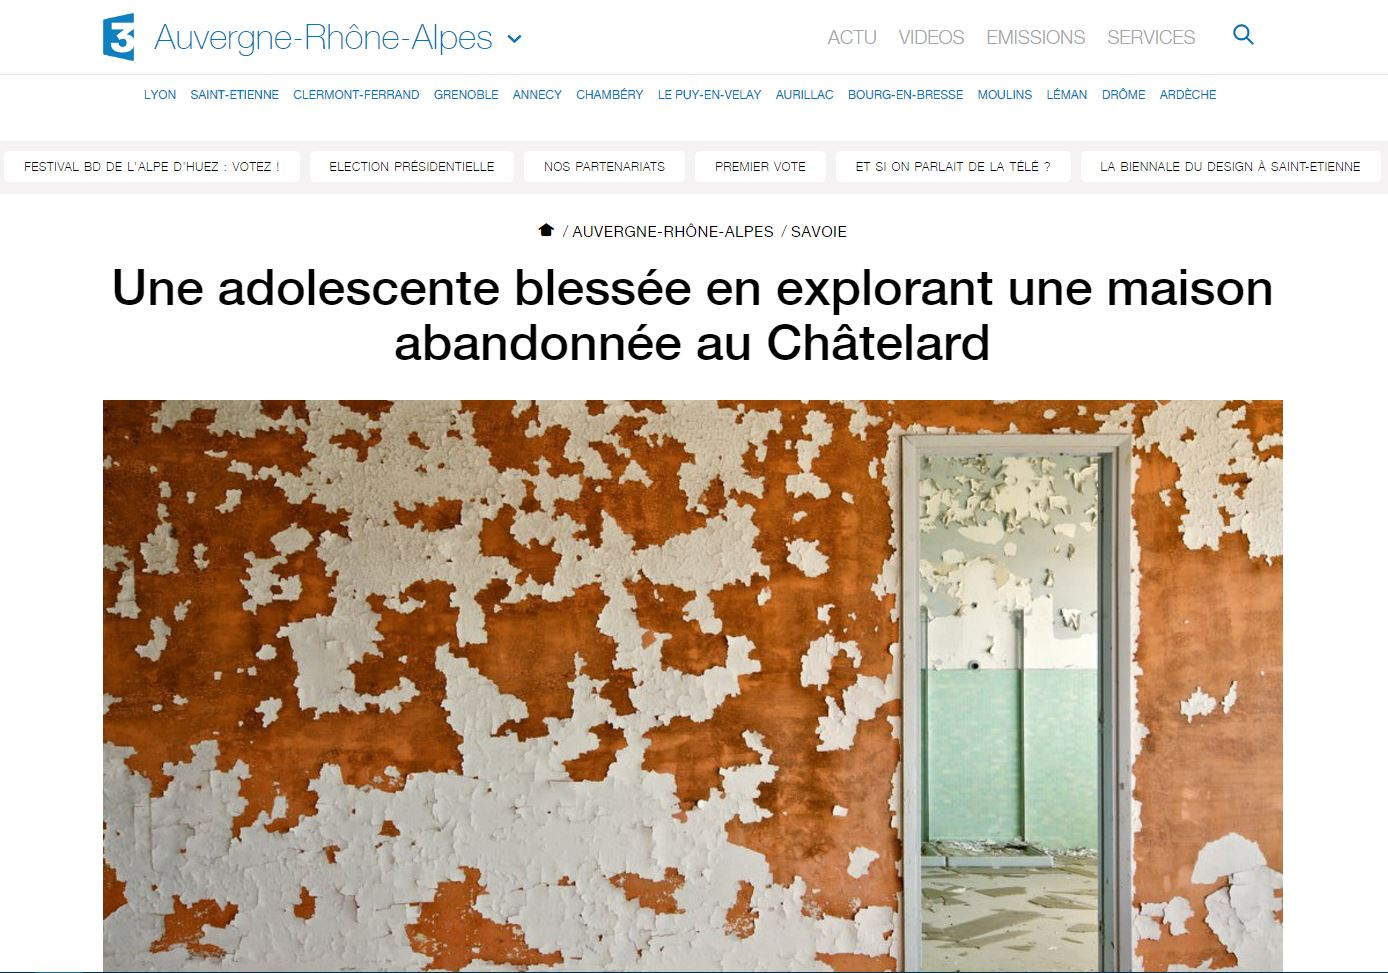 france3-auvergne-rhone-alpes-accident-urbex-12032017